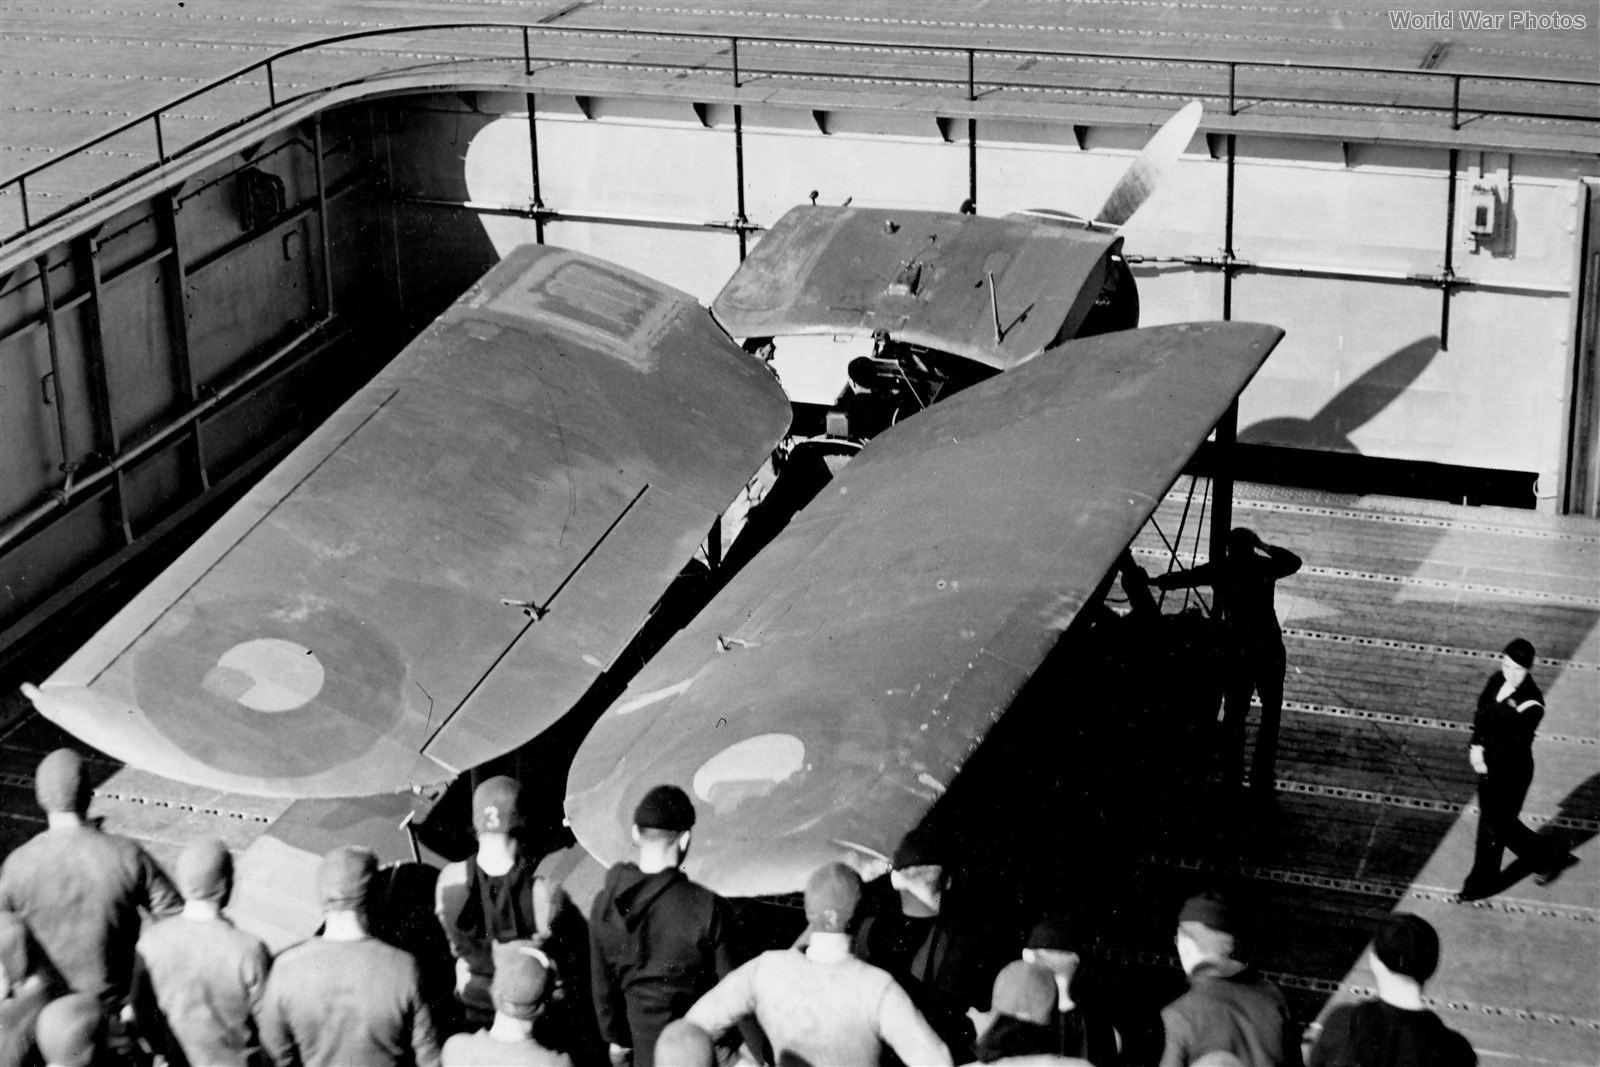 Fairey Swordfish on USS Wasp elevator April 1942